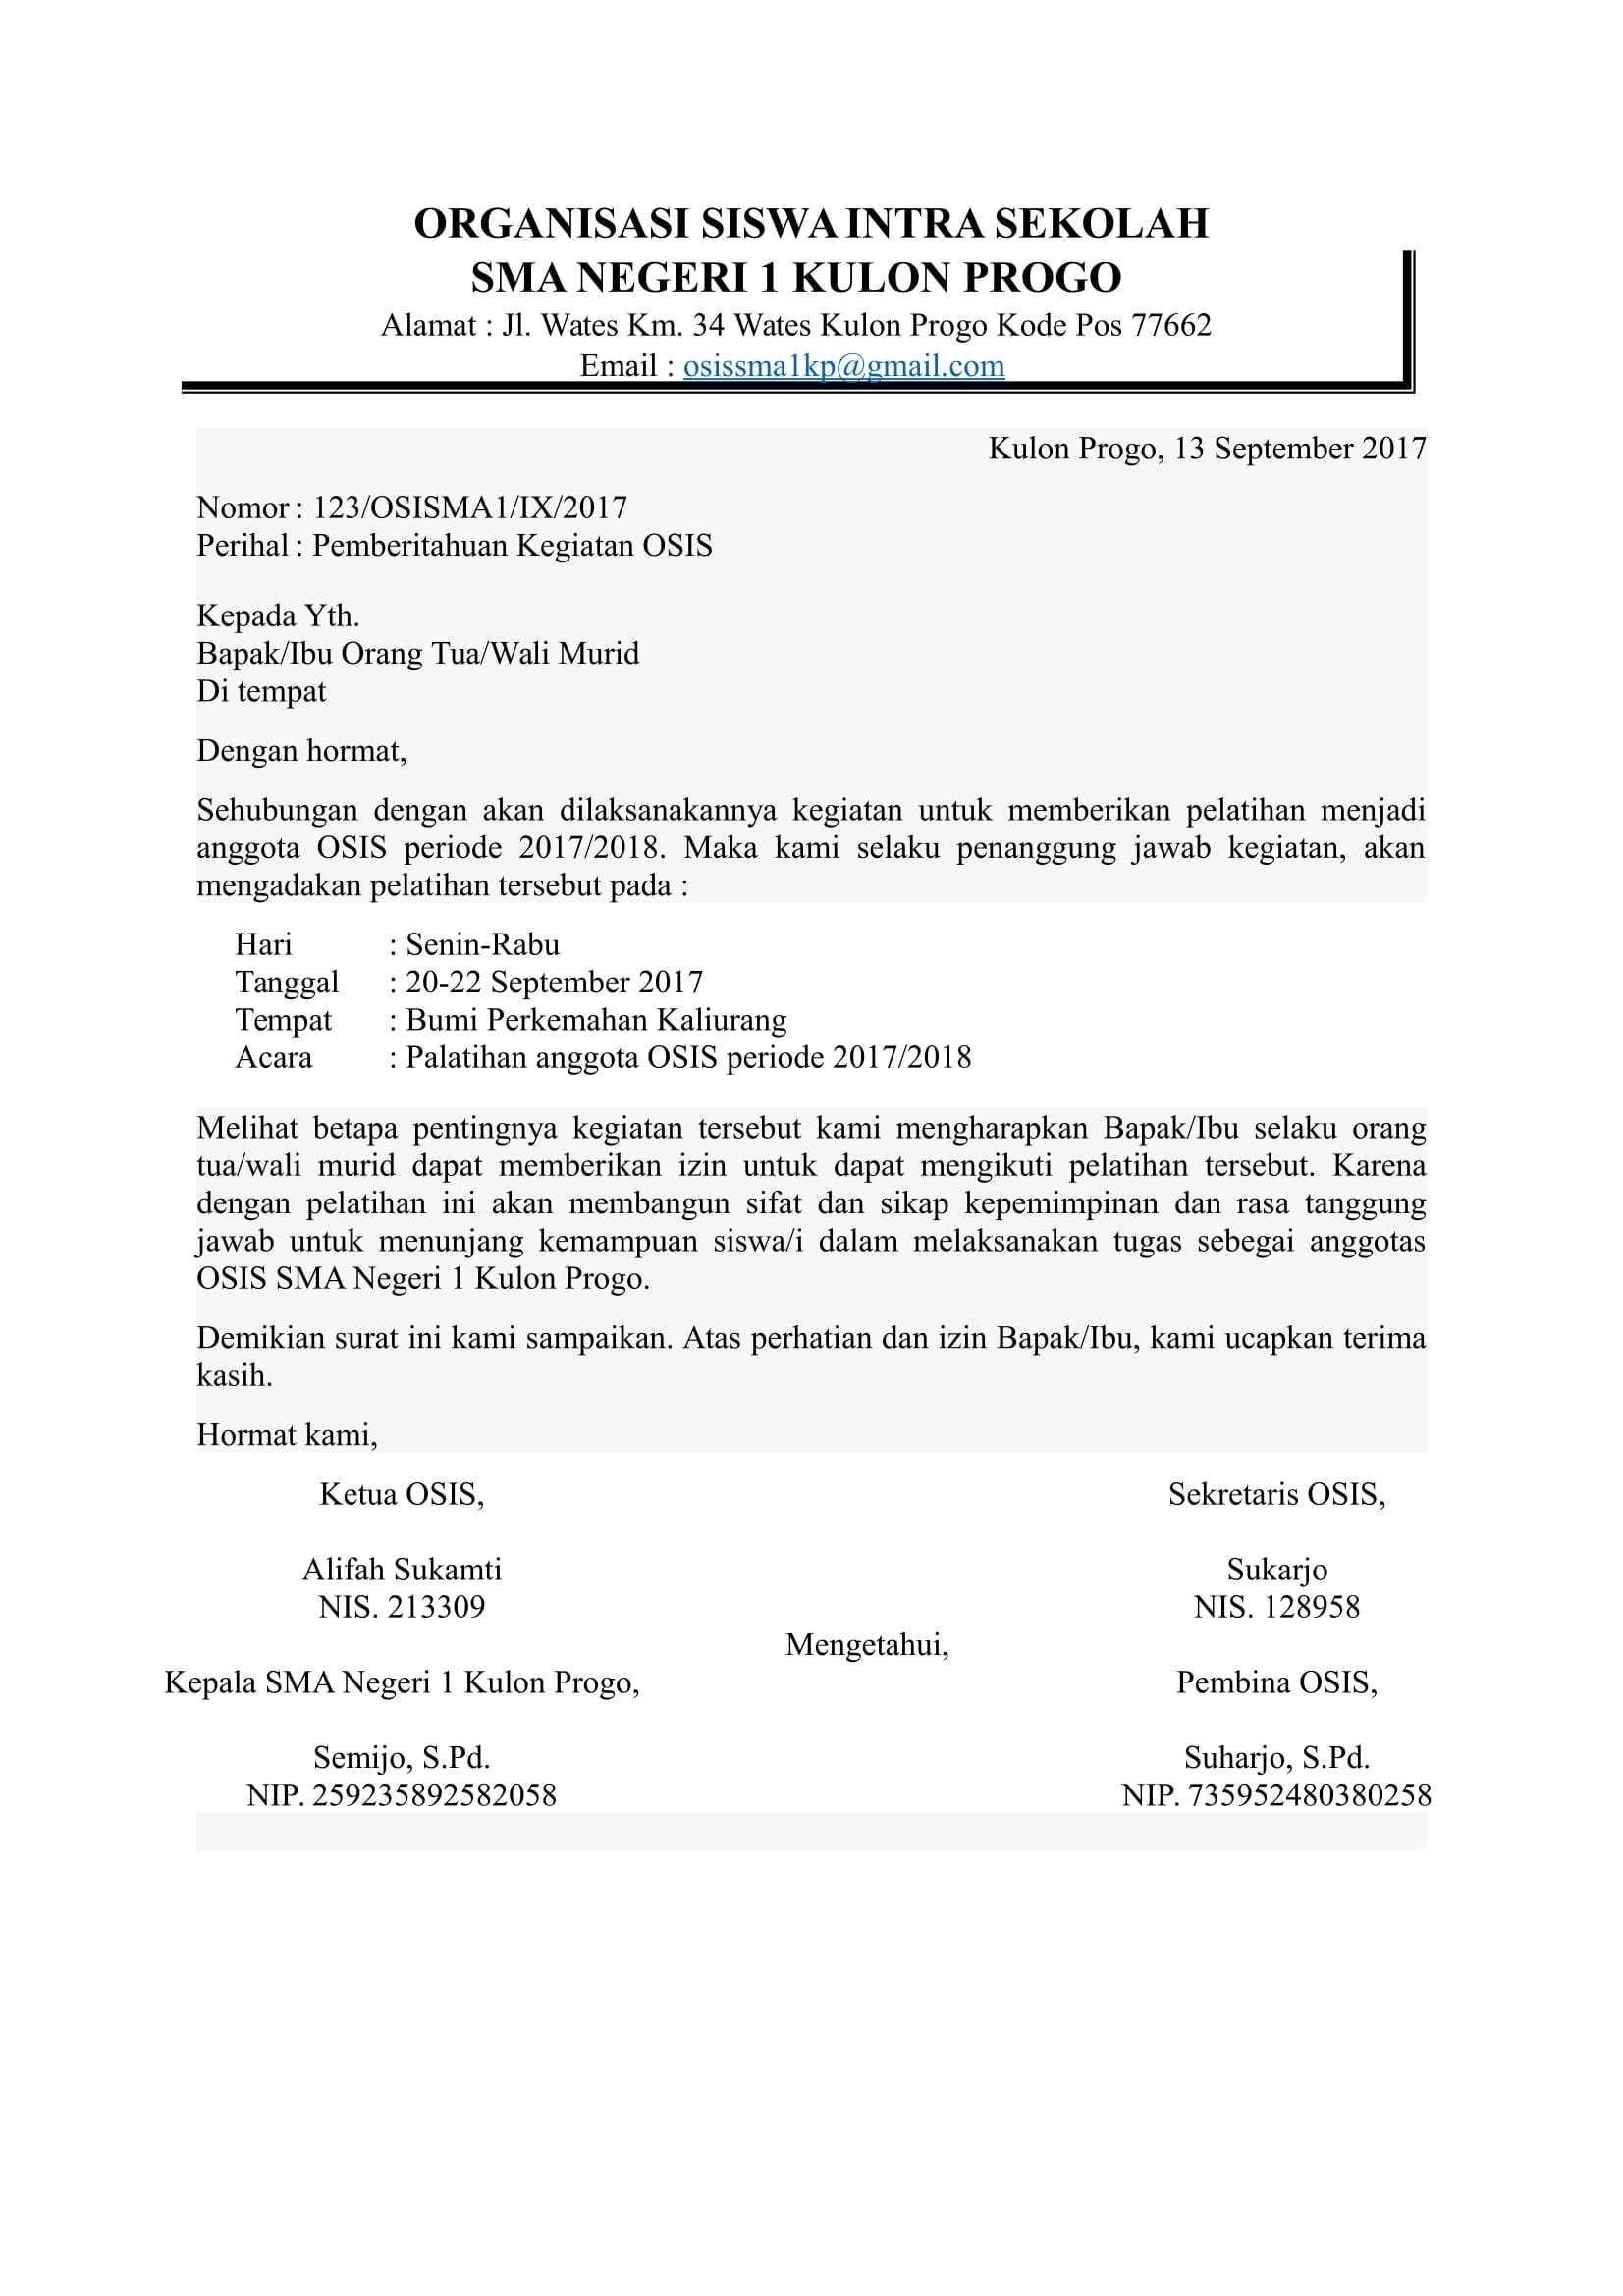 Contoh Surat Dinas Untuk Pembina Osis Surat Ilmu Sosial Sekolah